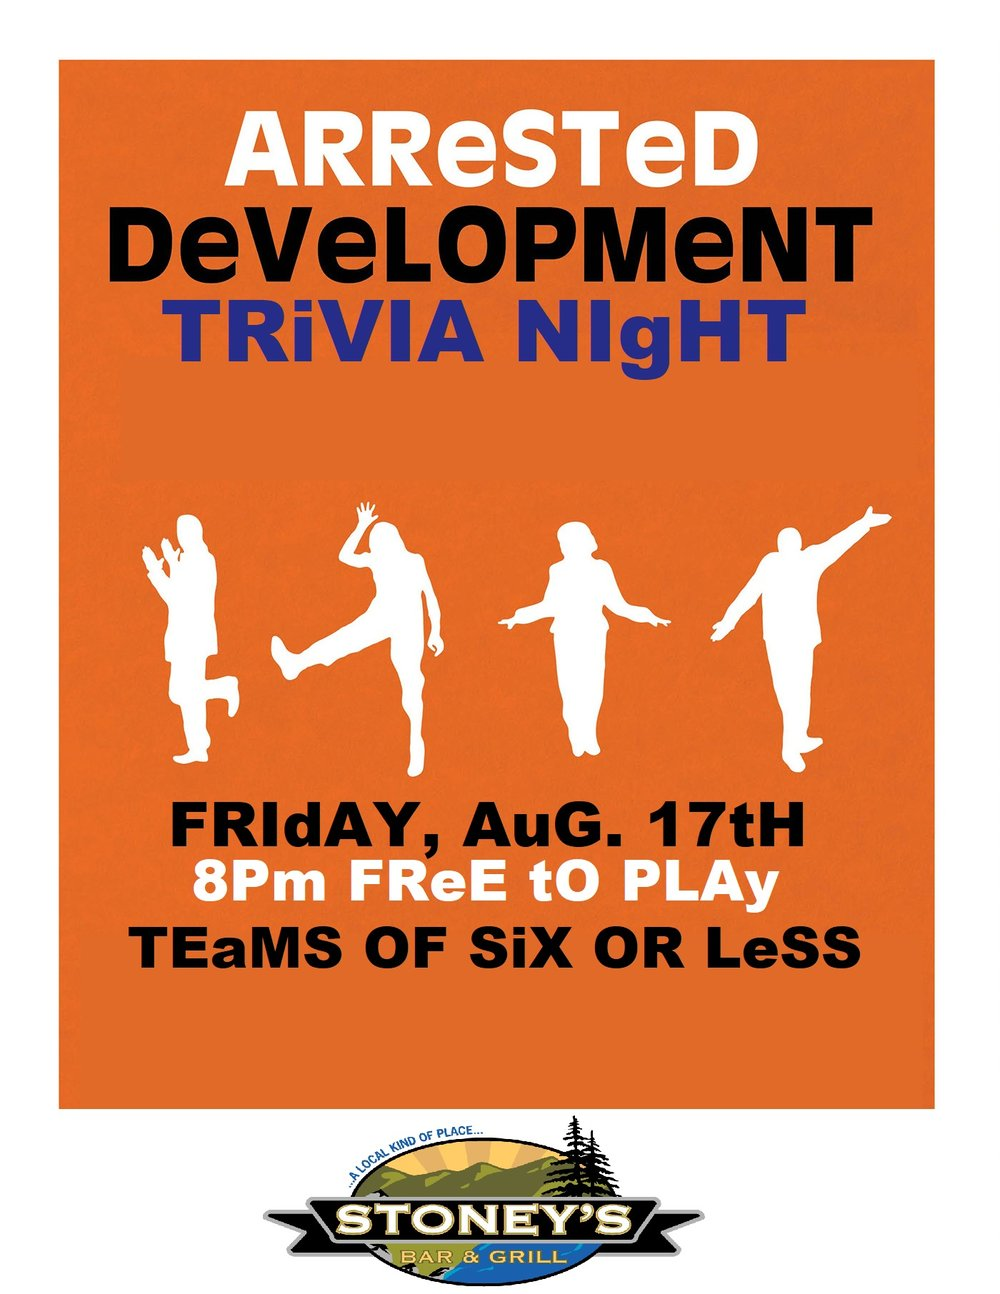 Arrested Development Trivia Poster.jpg